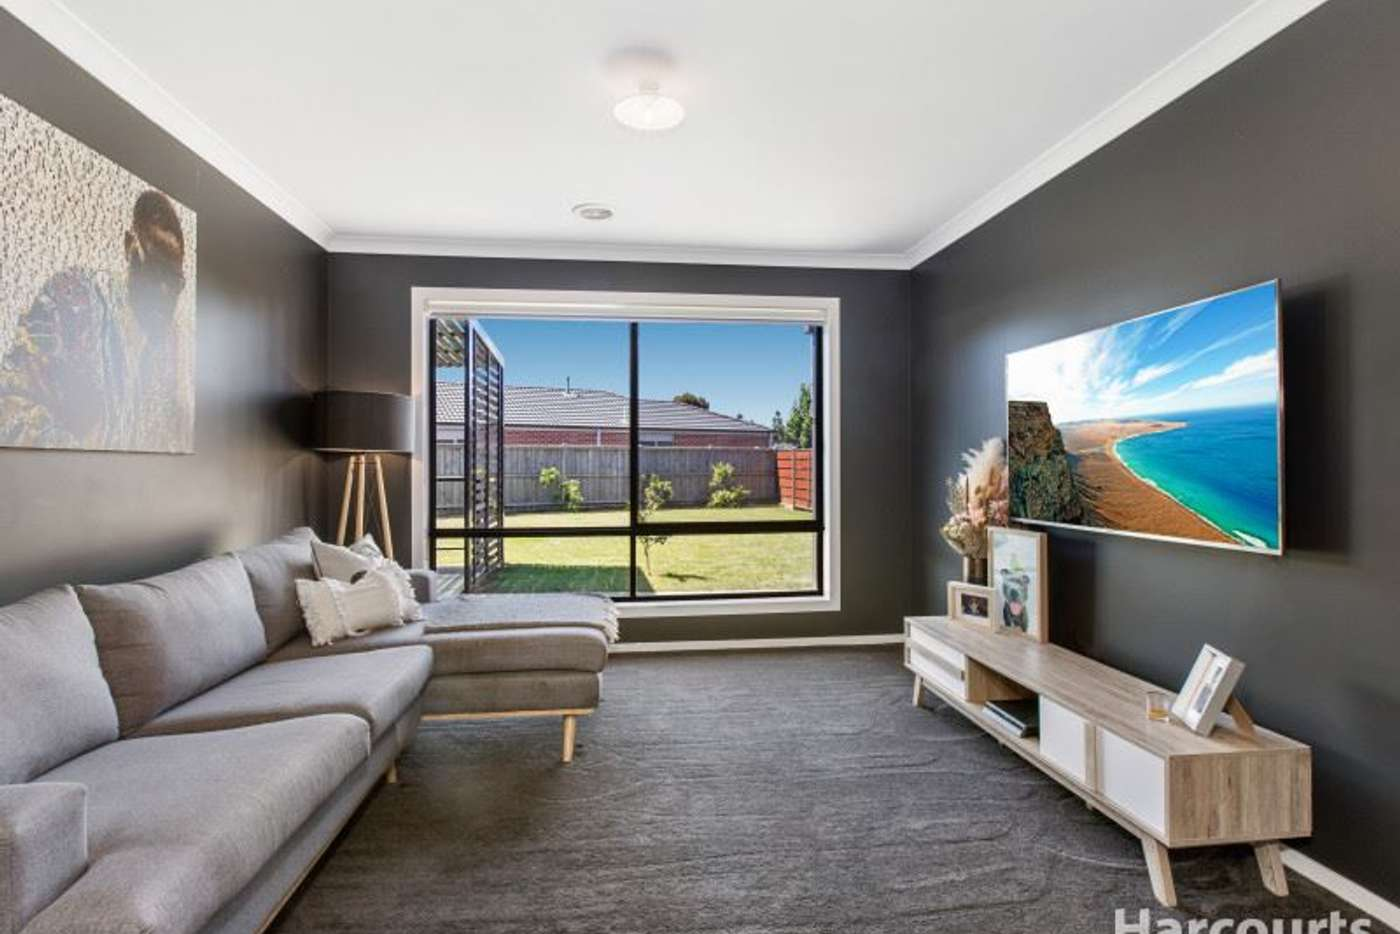 Sixth view of Homely house listing, 81 Davey Drive, Trafalgar VIC 3824